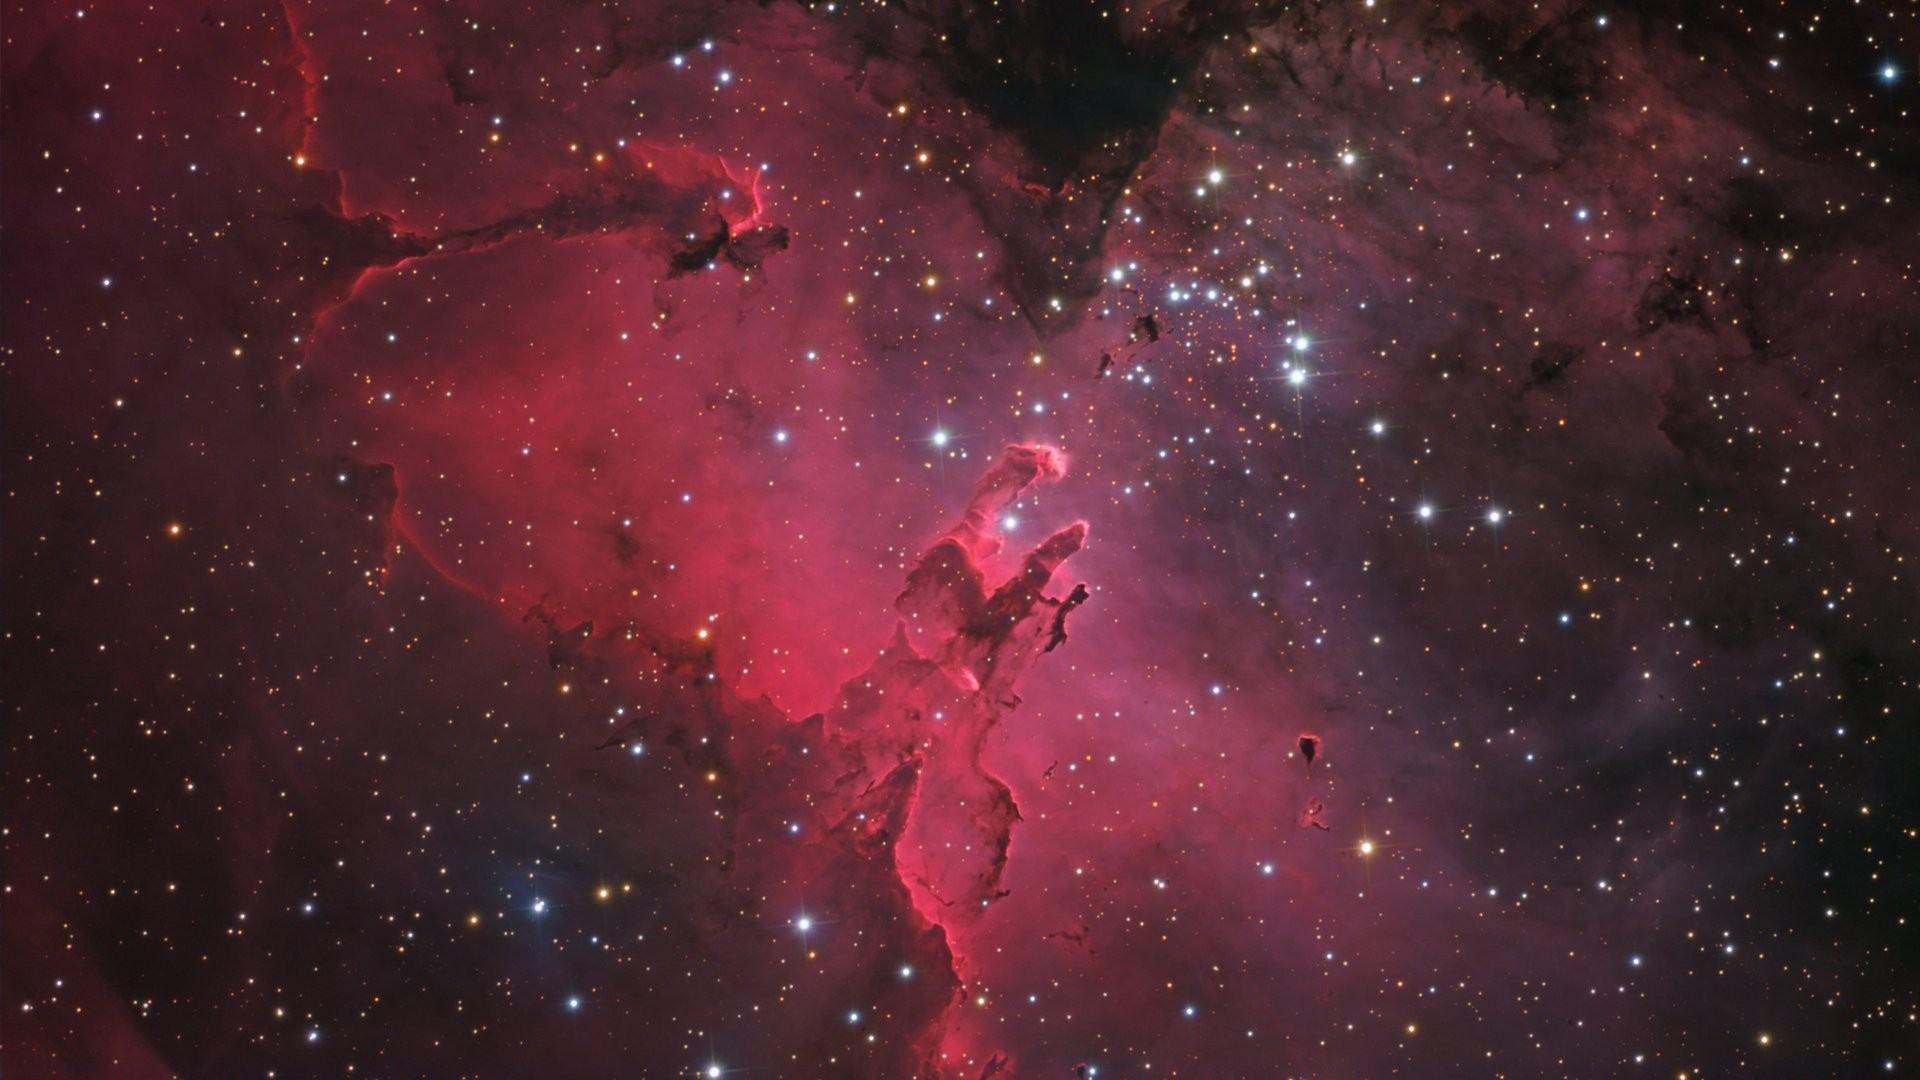 NASA Hubble Images High Re...